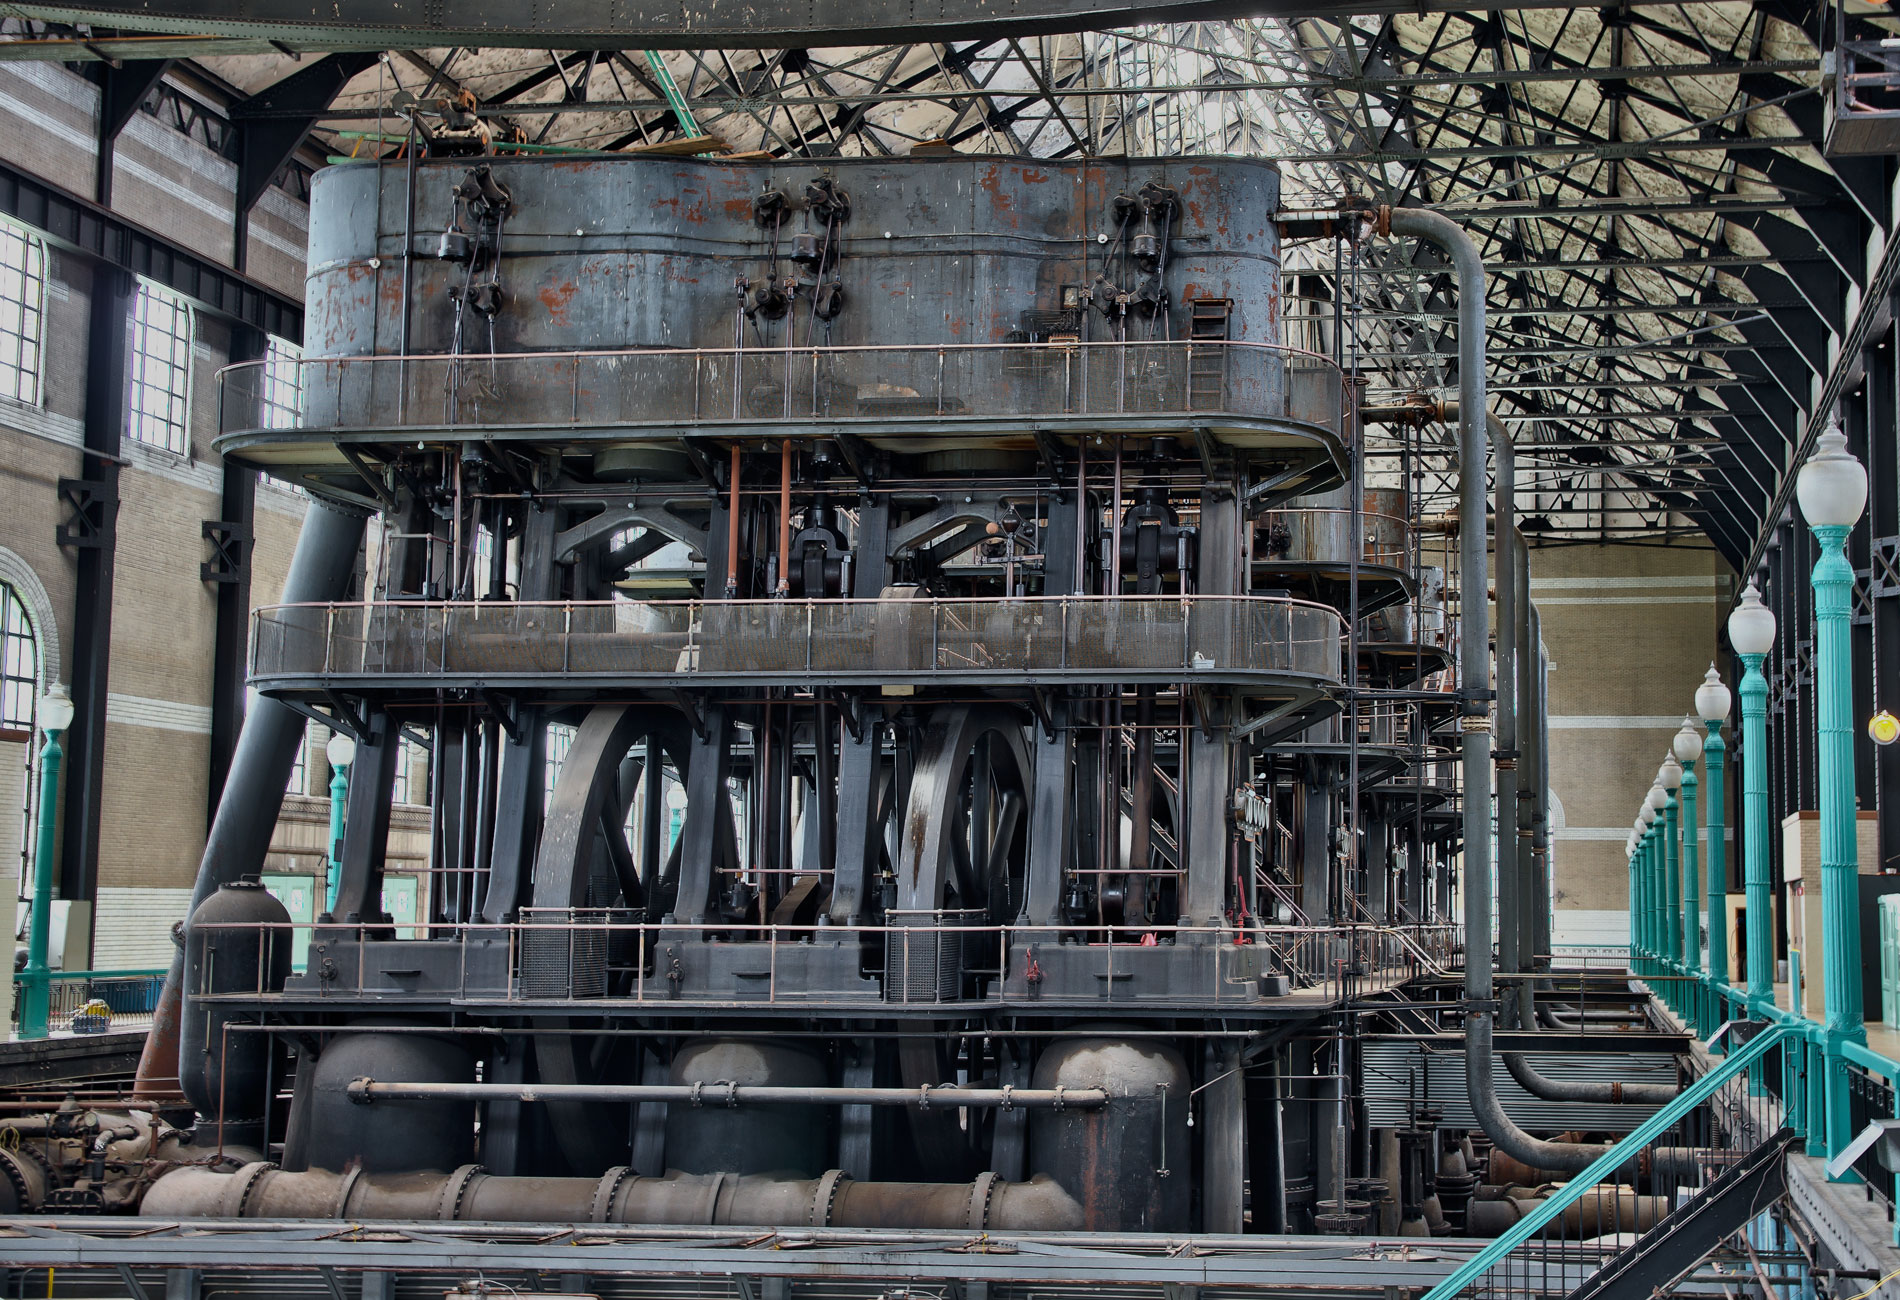 Pumping Station Darren Ketchum